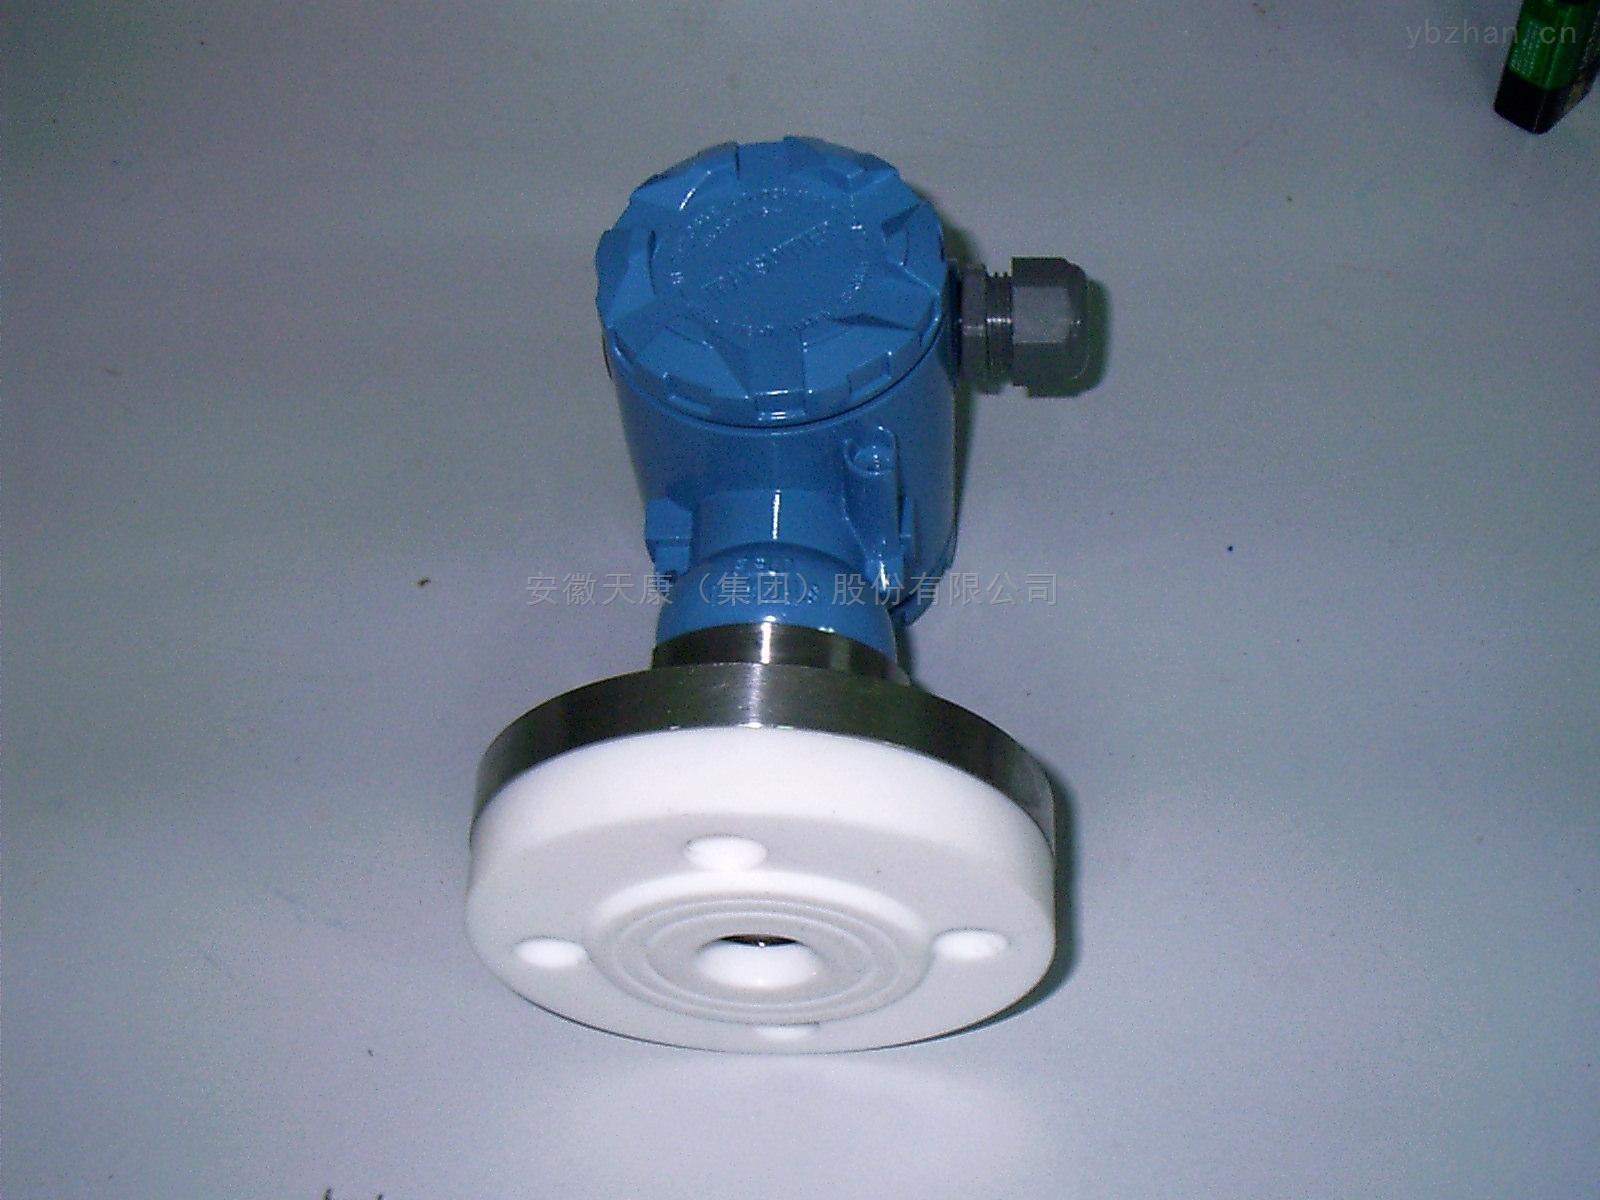 3051P-3051P高温防腐压力变送器